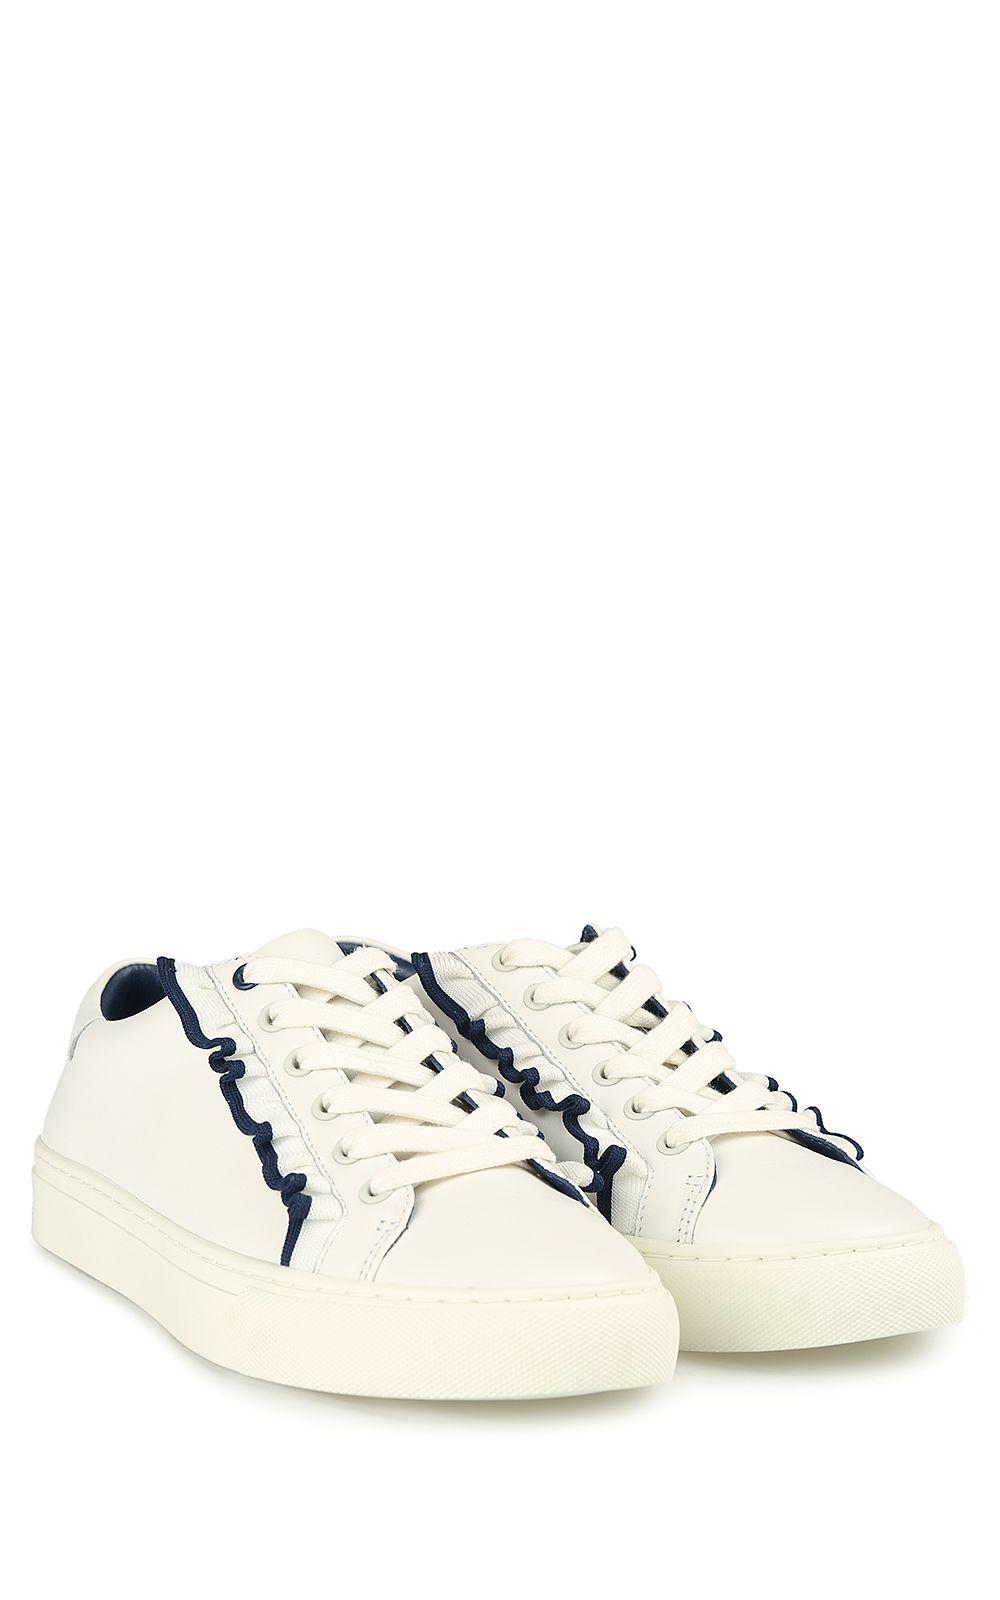 739135cba7f Tory Burch Tory Burch Tory Sport Ruffle-tim Leather Sneakers - White ...